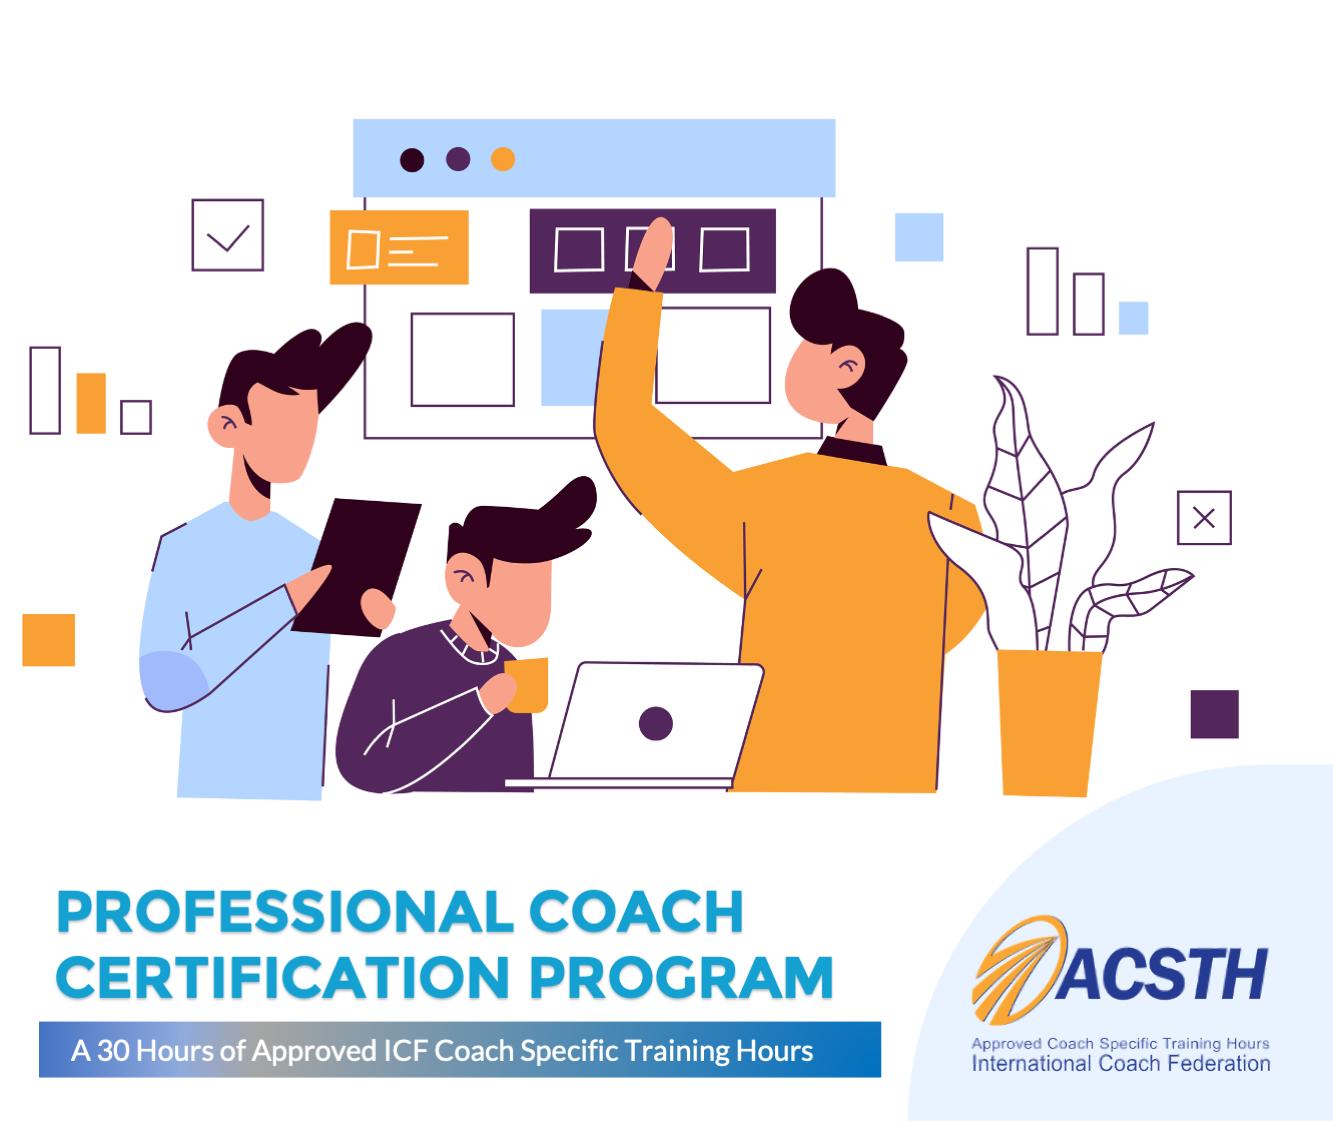 Professional Coach Certification Program - Batch 100